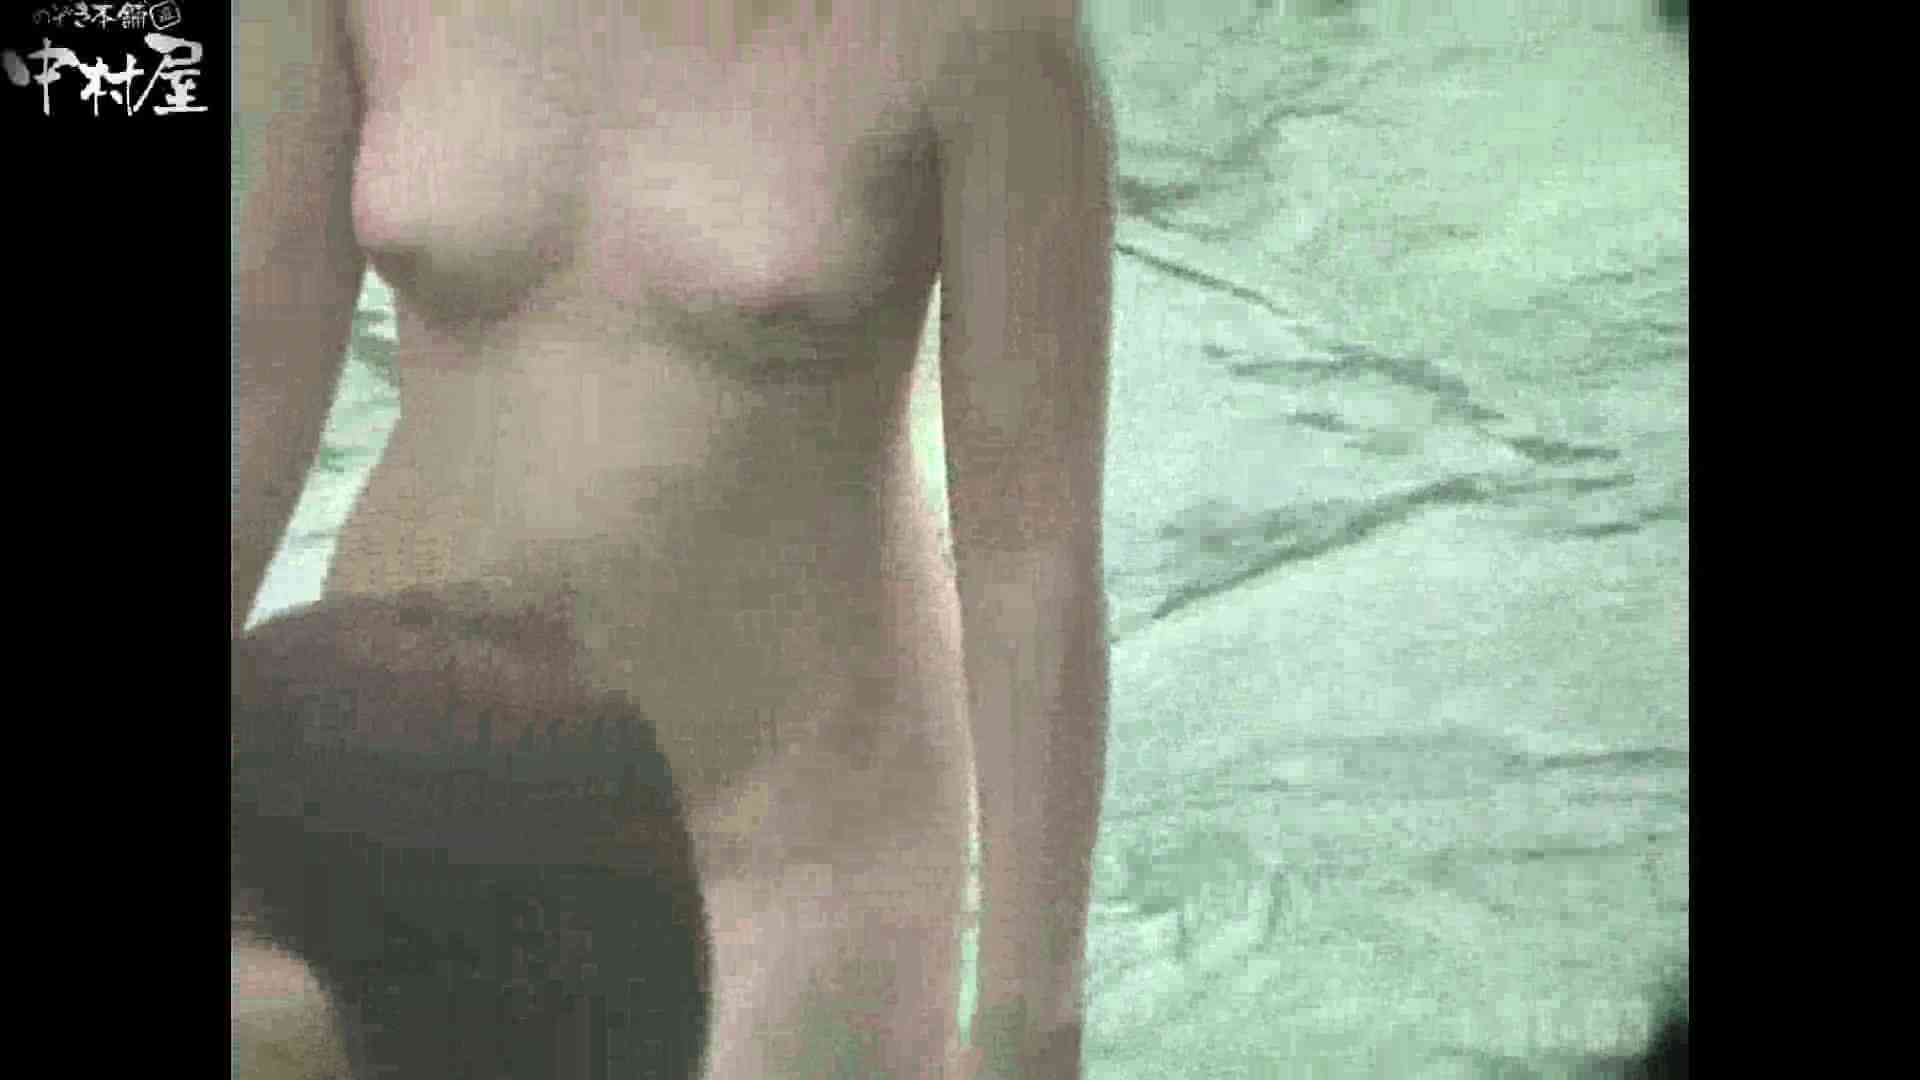 Aquaな露天風呂Vol.867潜入盗撮露天風呂参判湯 其の二 露天 SEX無修正画像 58画像 23